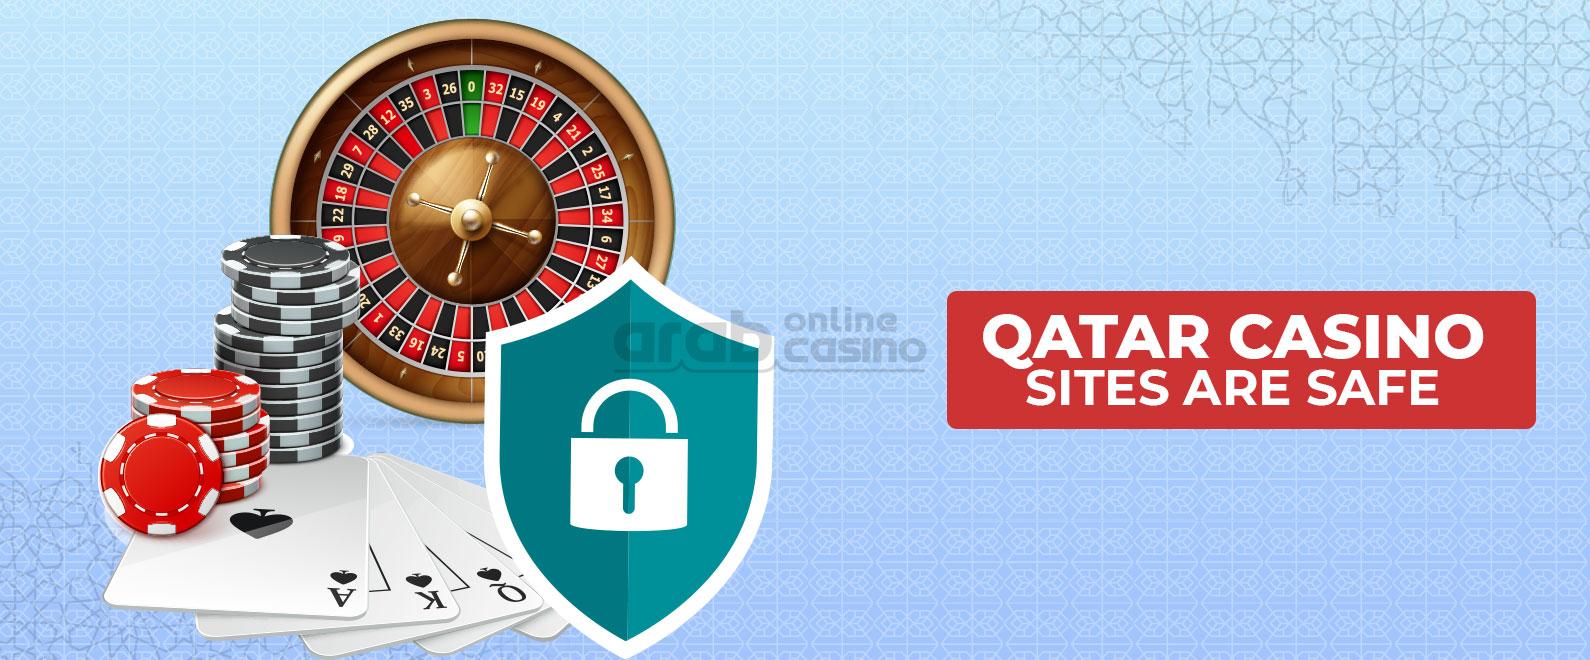 qatar casinos are safe